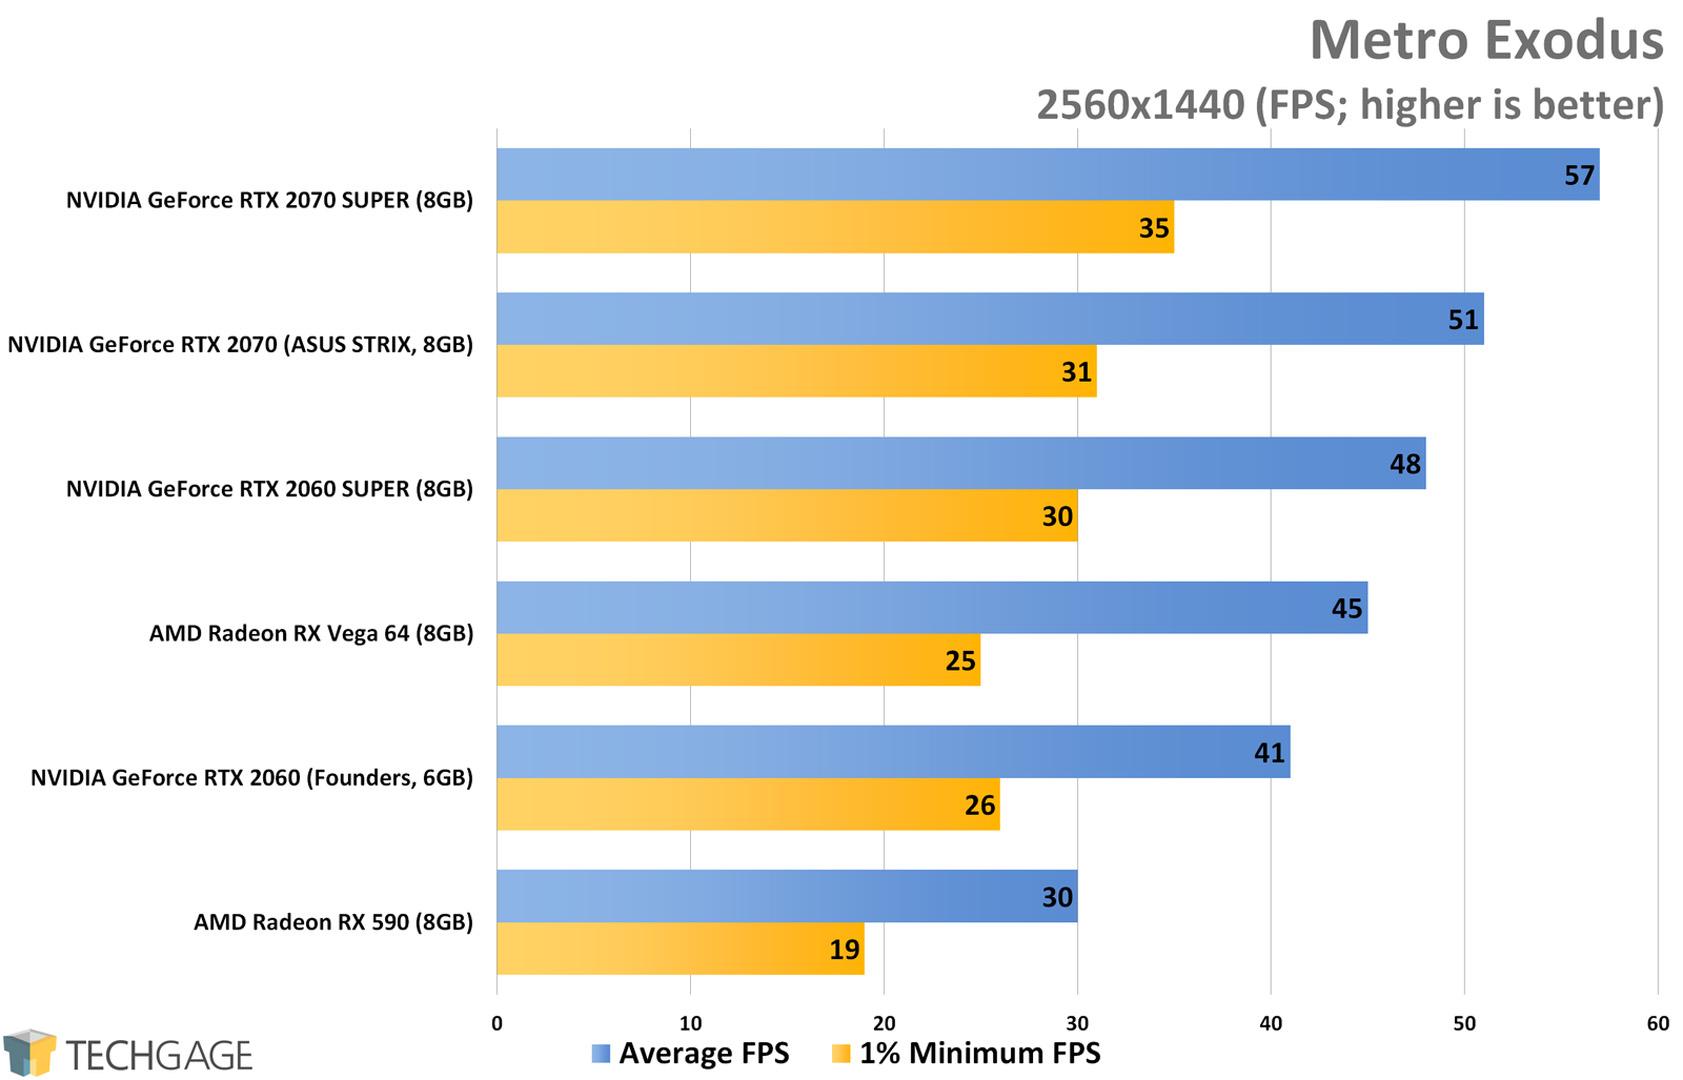 Metro Exodus (1440p) - NVIDIA RTX SUPER 2060 and 2070 Performance